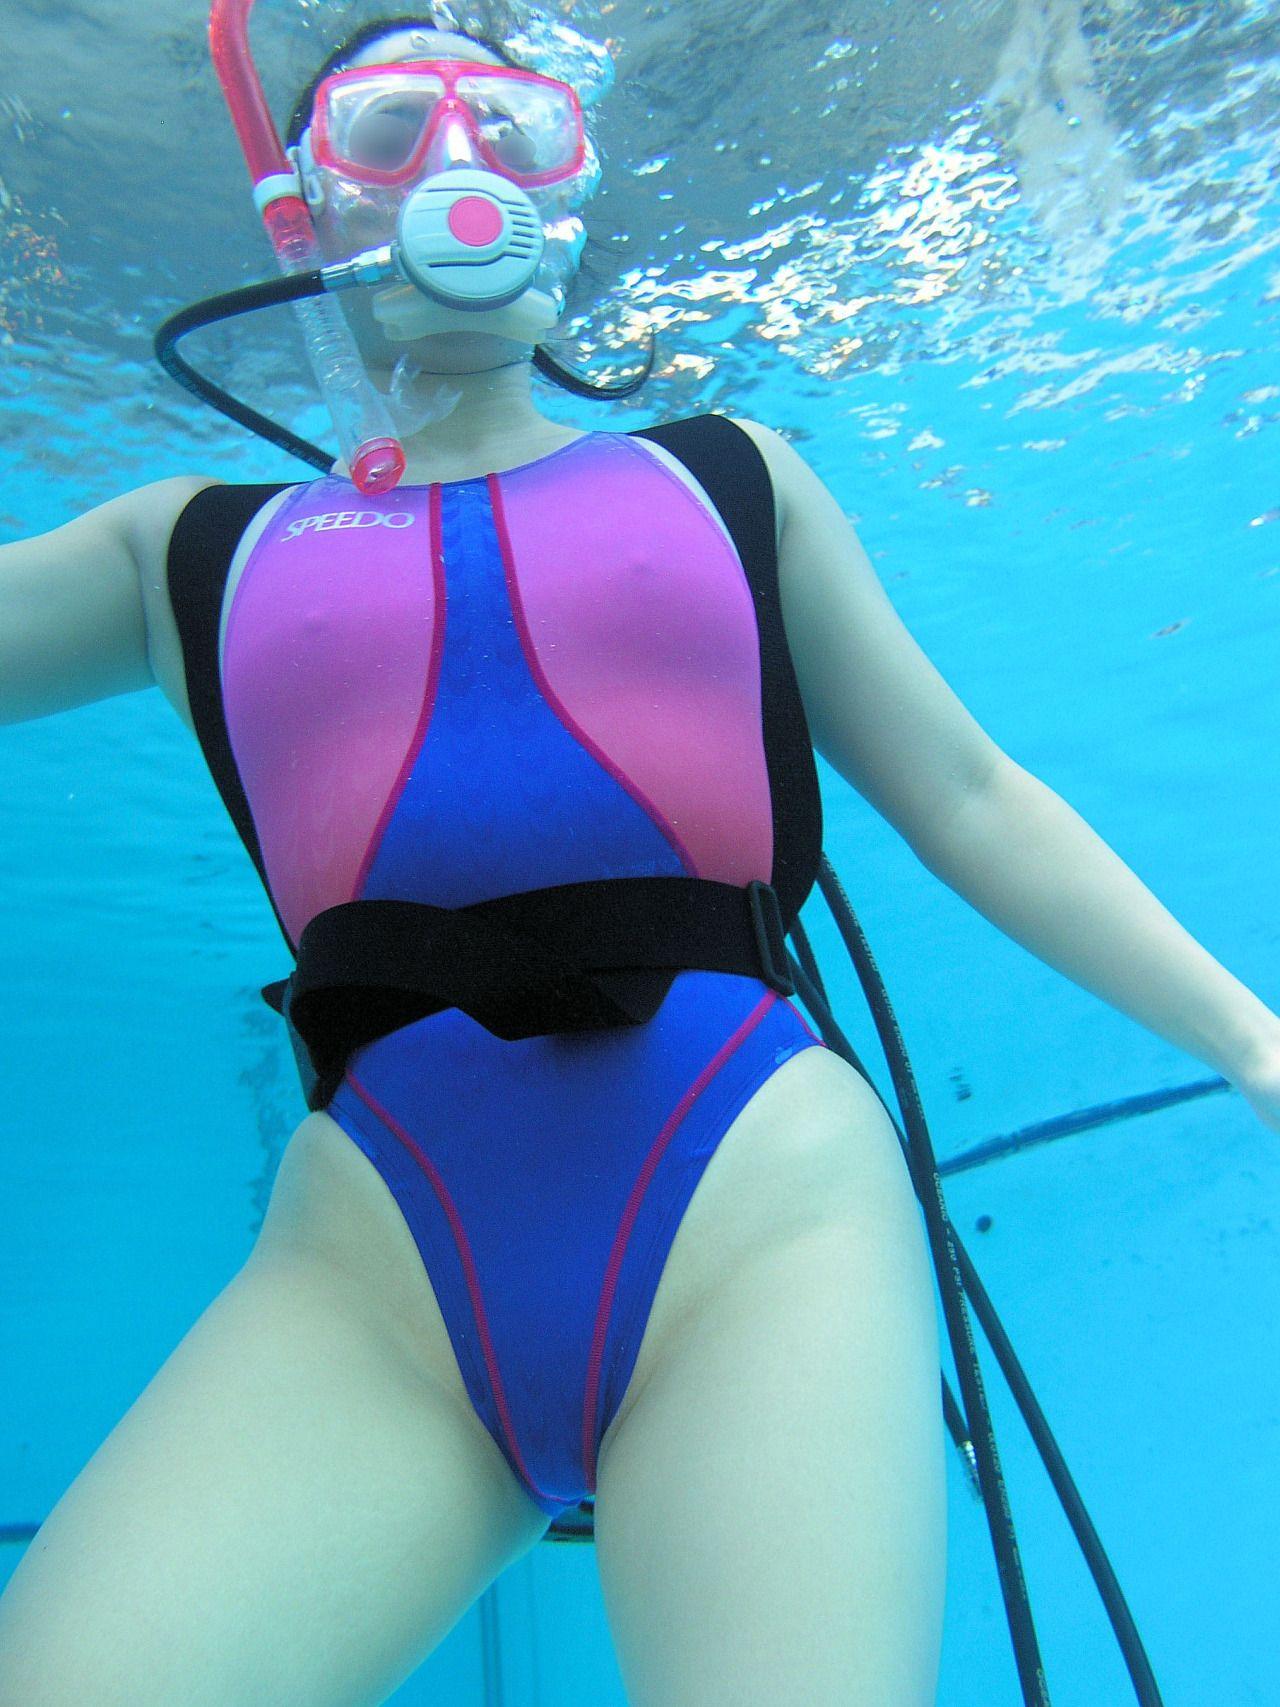 Underwater woman portrait with pink bikini in swimming pool stock image